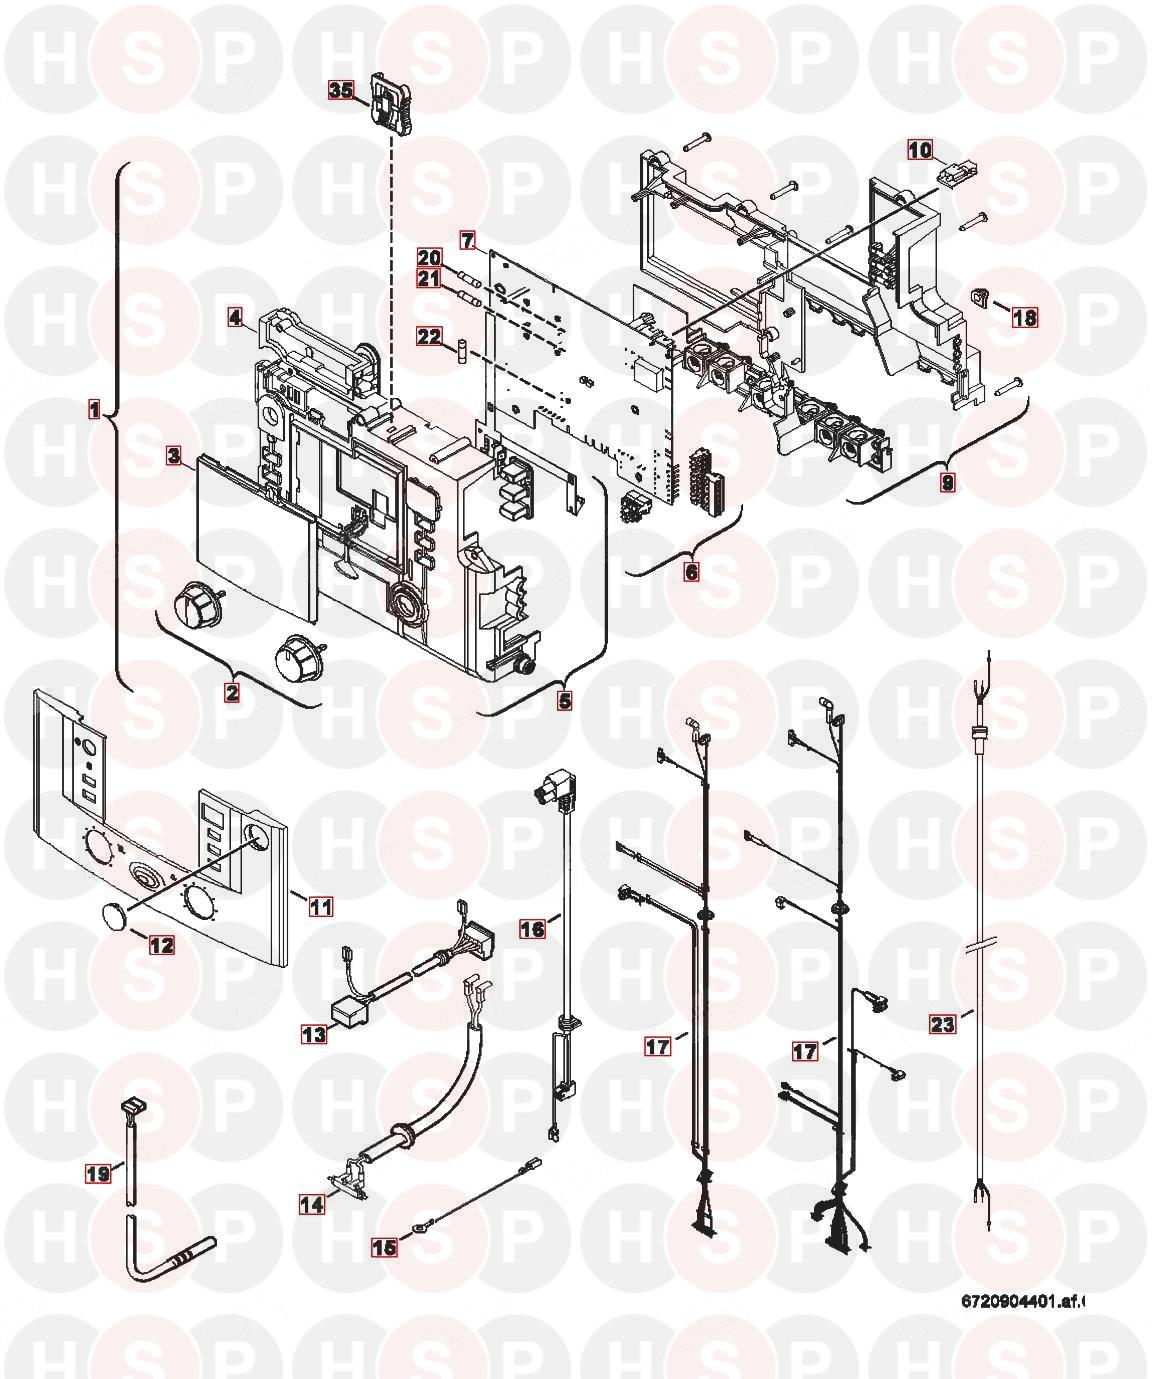 Worcester GREENSTAR 38CDI CLASSIC ERP (CONTROL BOX